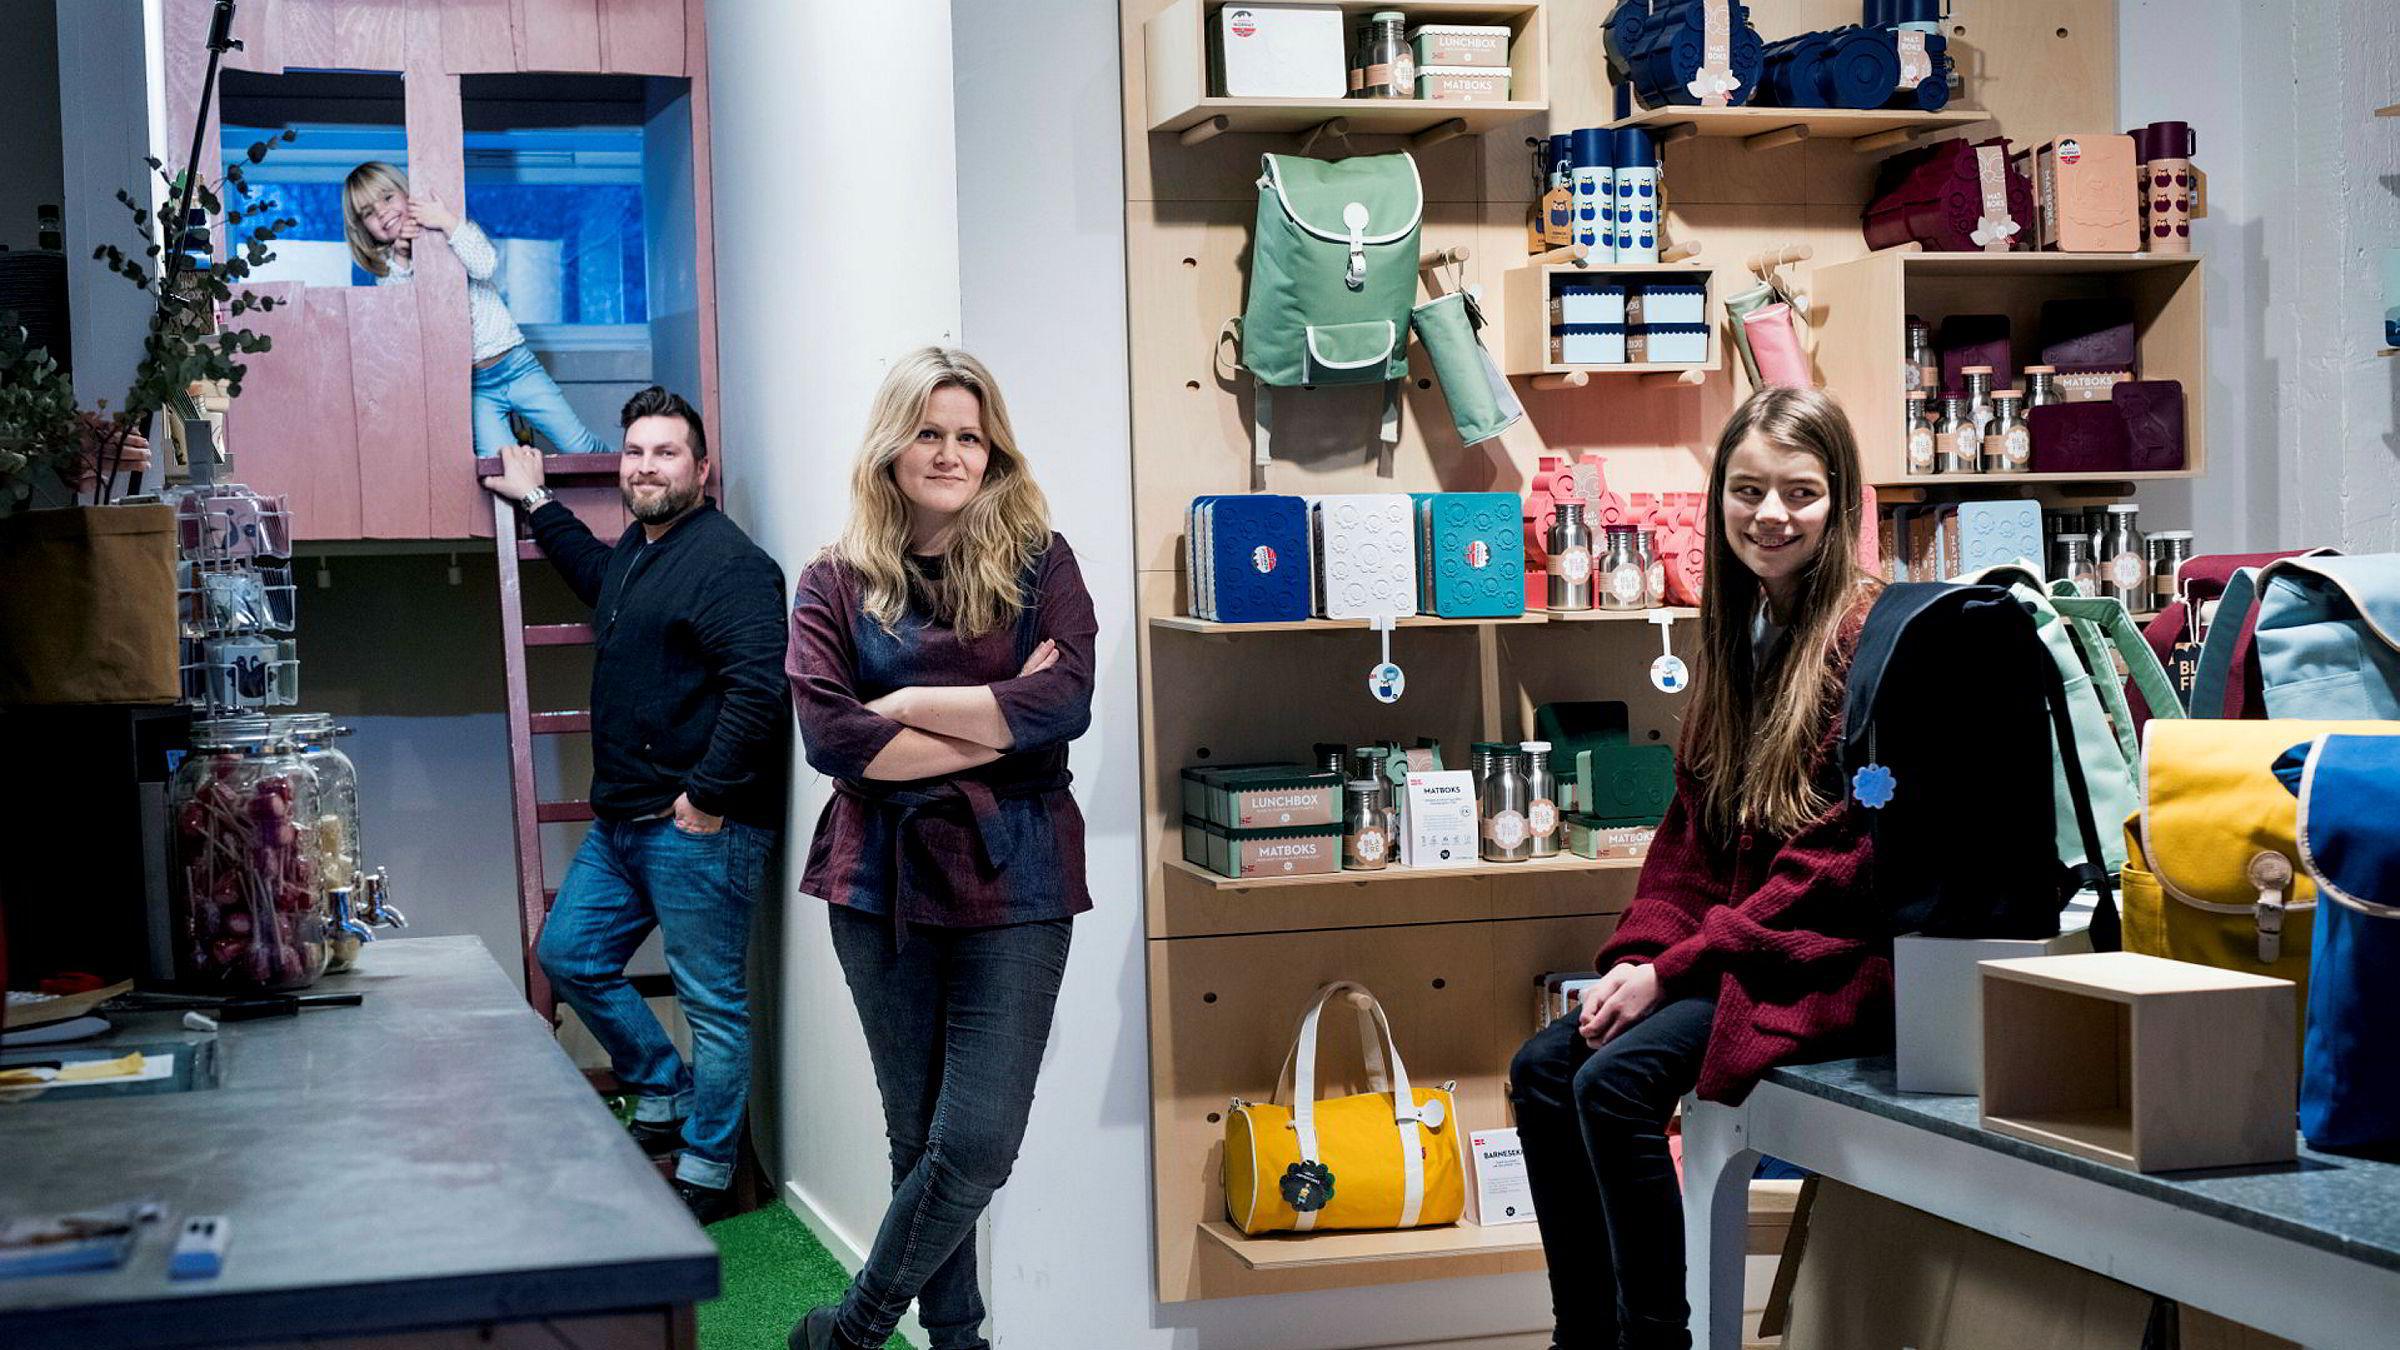 Blafre-familien har showroom på Ekeberg i Oslo. Fra venstre junior produktrådgiver Lotta Johanna (5), produktsjef Remi David Fagervik (45), gründer Ingrid Erøy Fagervik (40) og senior produktrådgiver Nora Mathea (12).